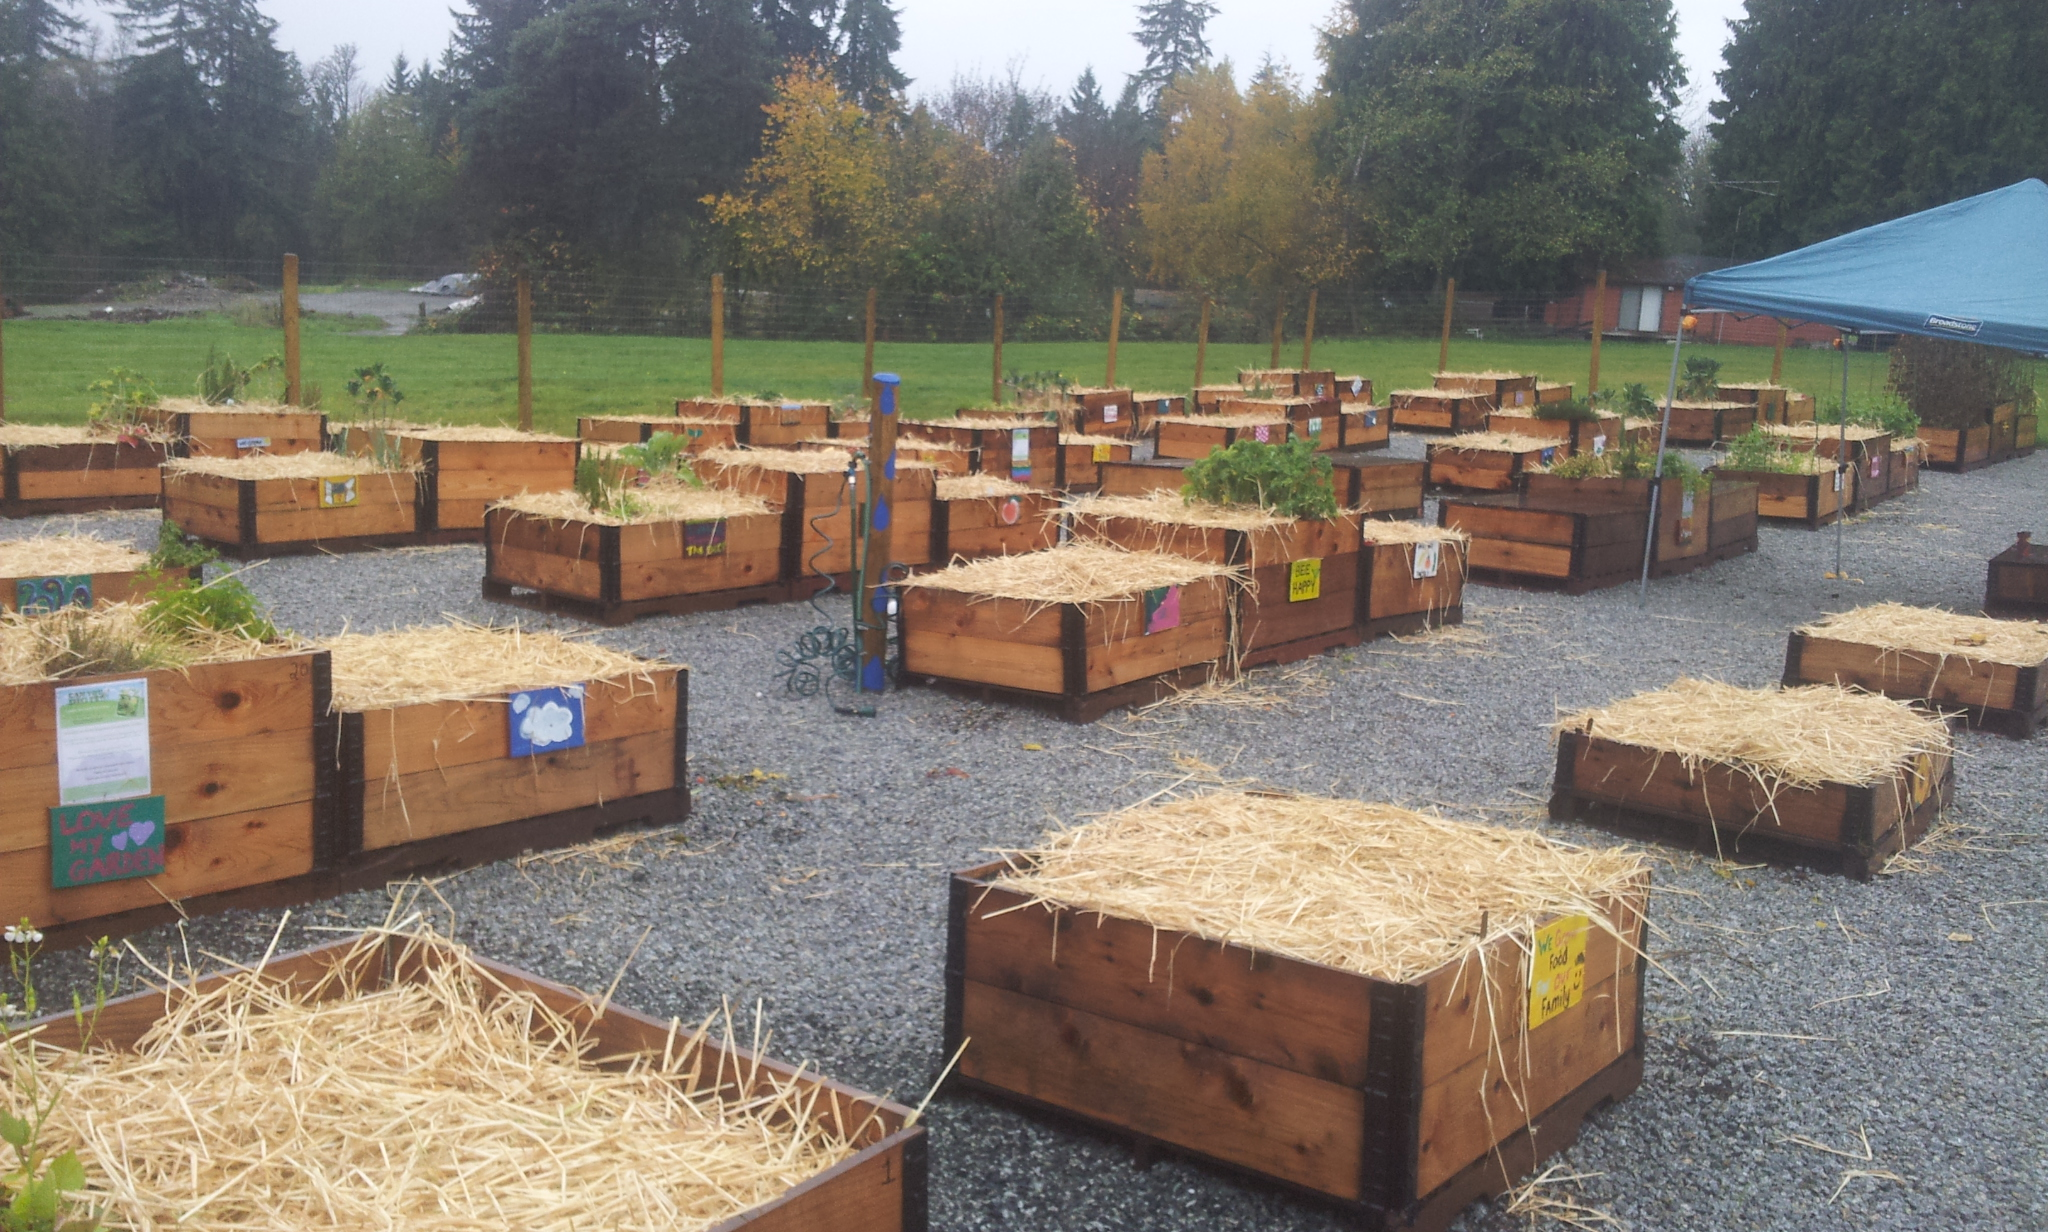 burke-mountain-temporary-community-garden-closing-112013_11244584505_o.jpg